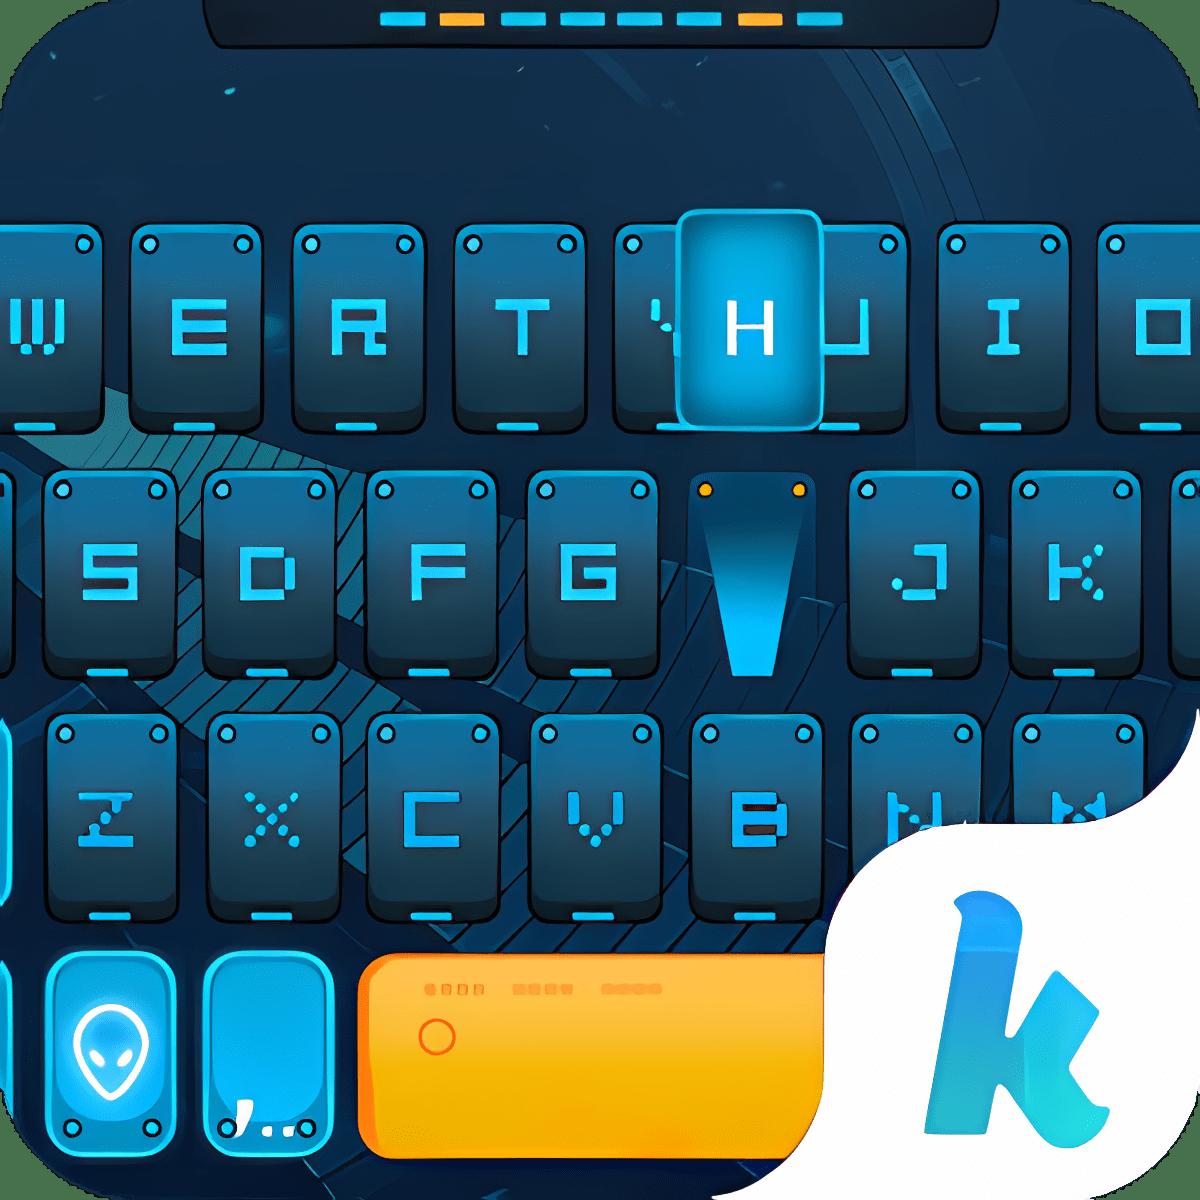 Future Warrior Kika Keyboard 1.0